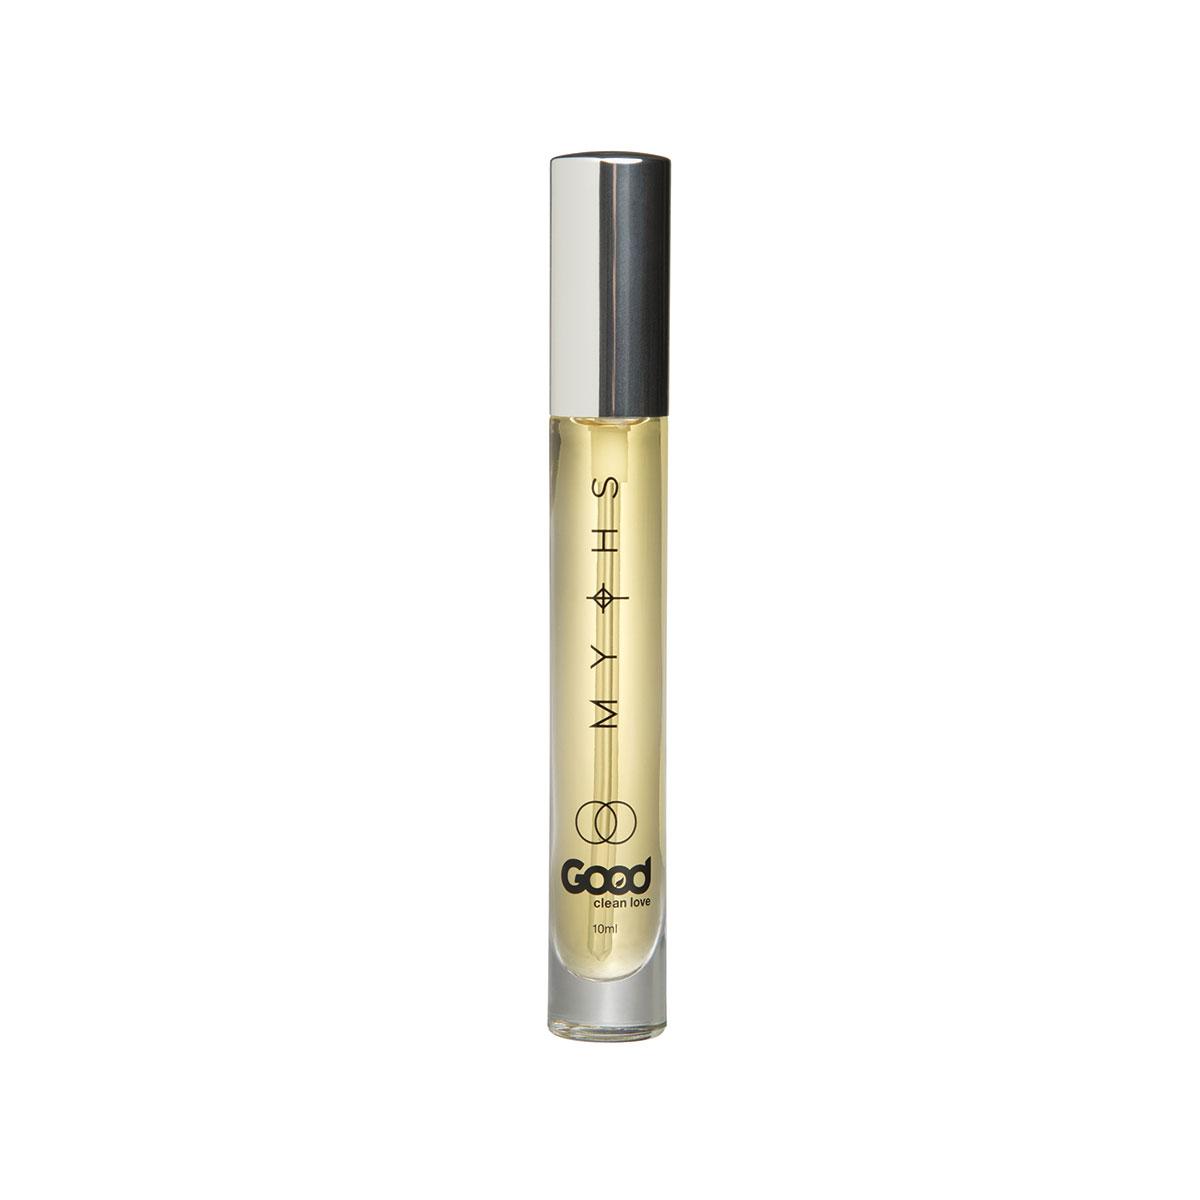 Myths Organic Aphrodisiac Perfume for Women